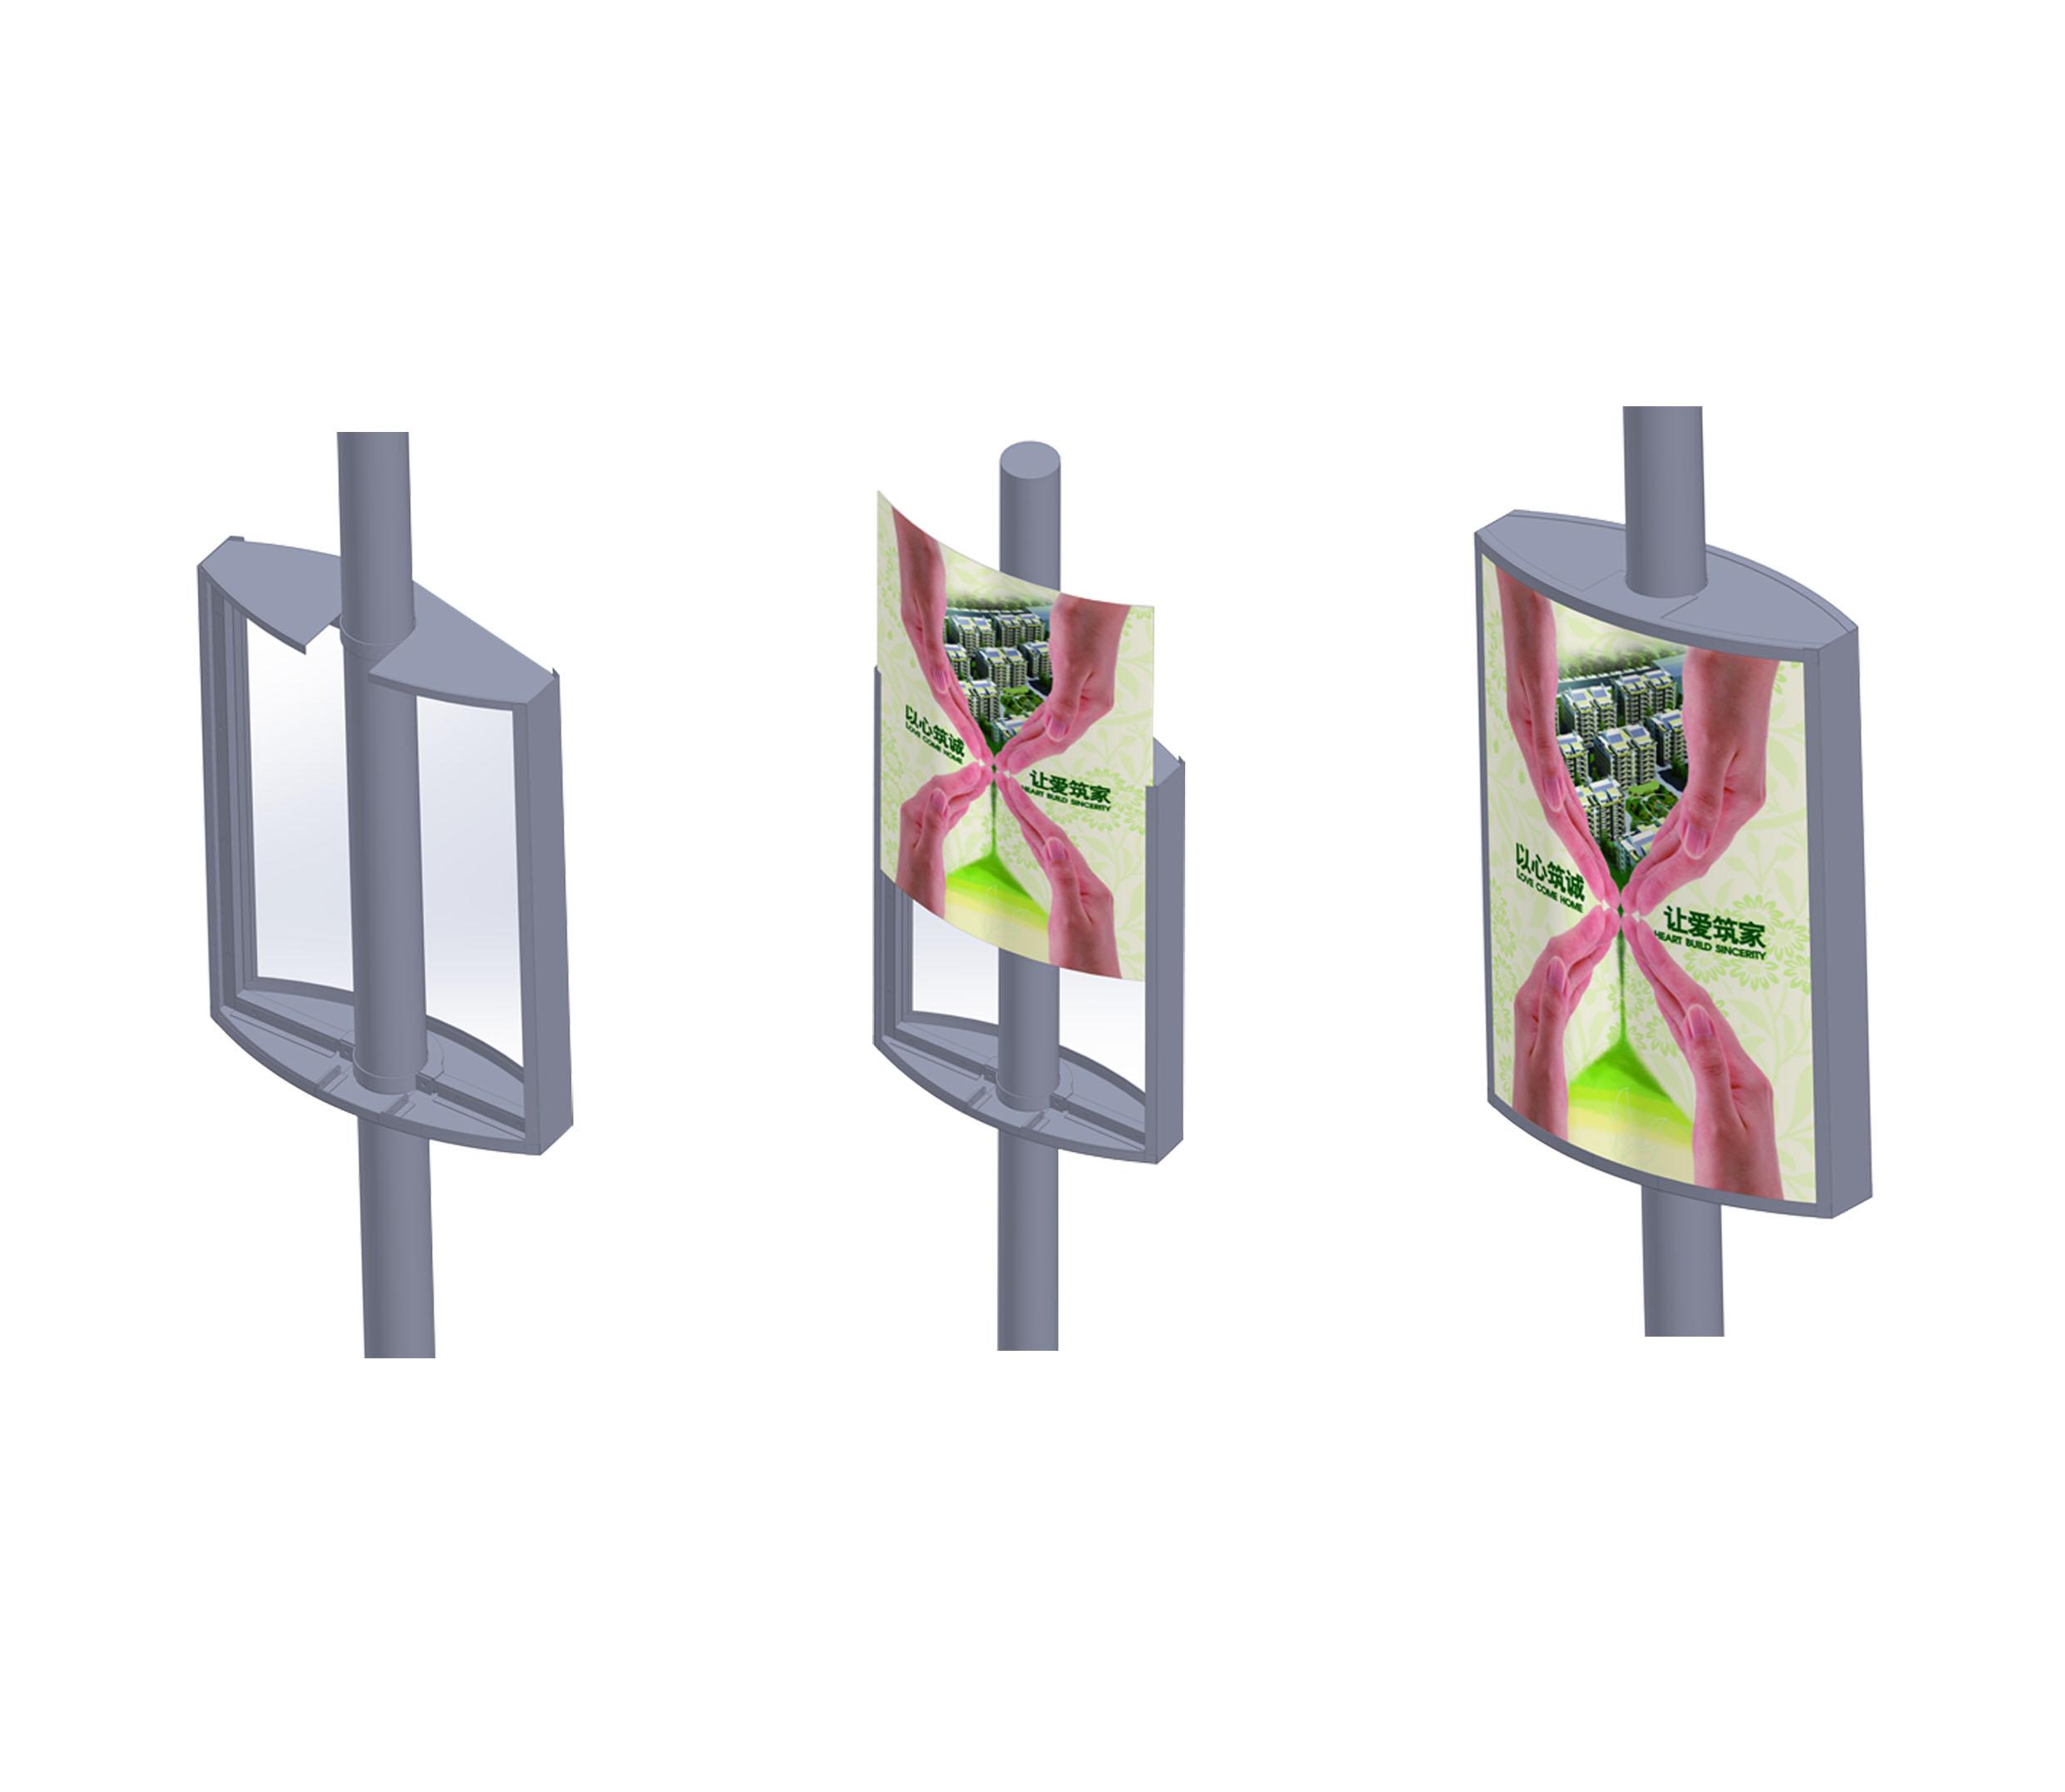 YEROO-High-quality Pole Led Display | Outdoor Light Pole Display-2